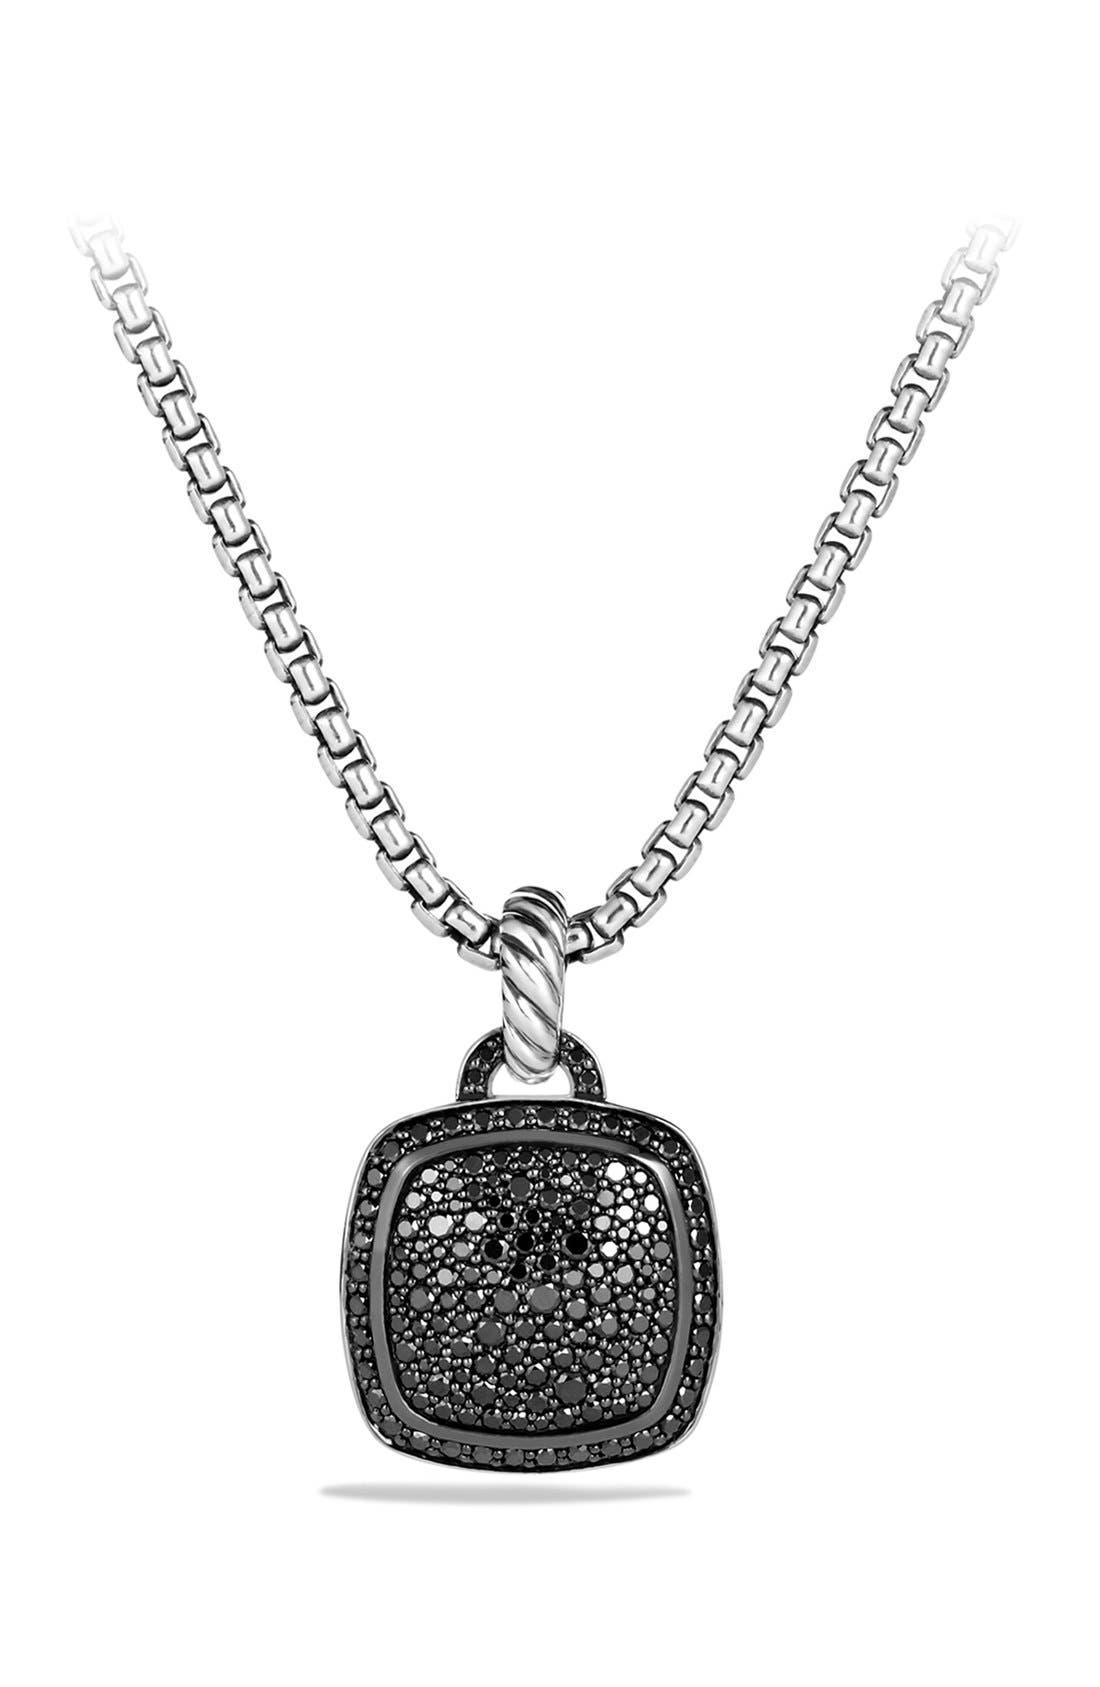 Main Image - David Yurman 'Albion' Pendant with Diamonds